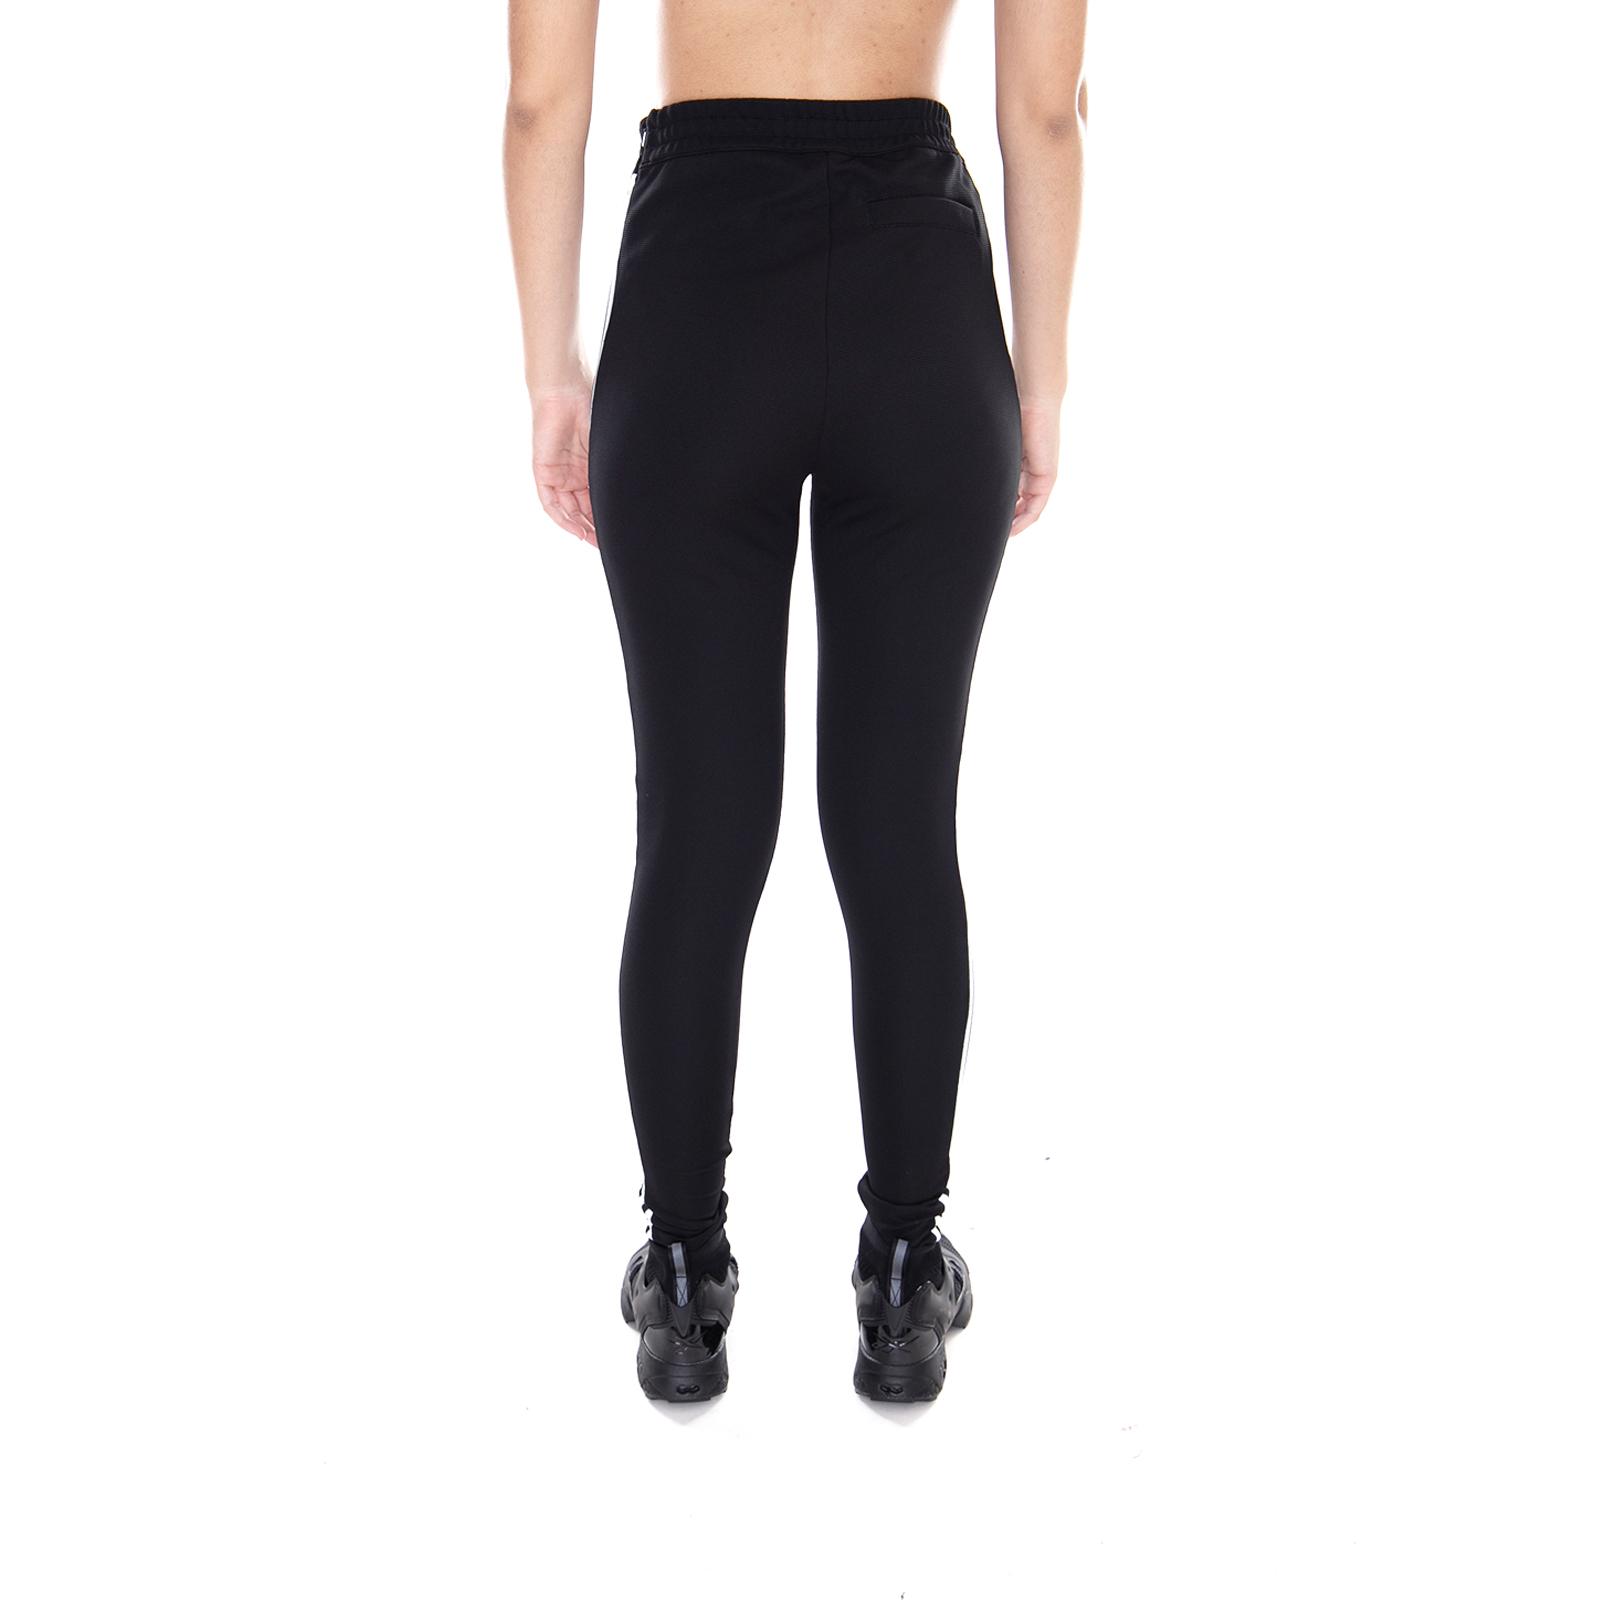 Pantalon Black Noir Black Adidas Noir Pantalon Black Noir Adidas Haleter Haleter Haleter Adidas Pantalon Adidas p6tUqw